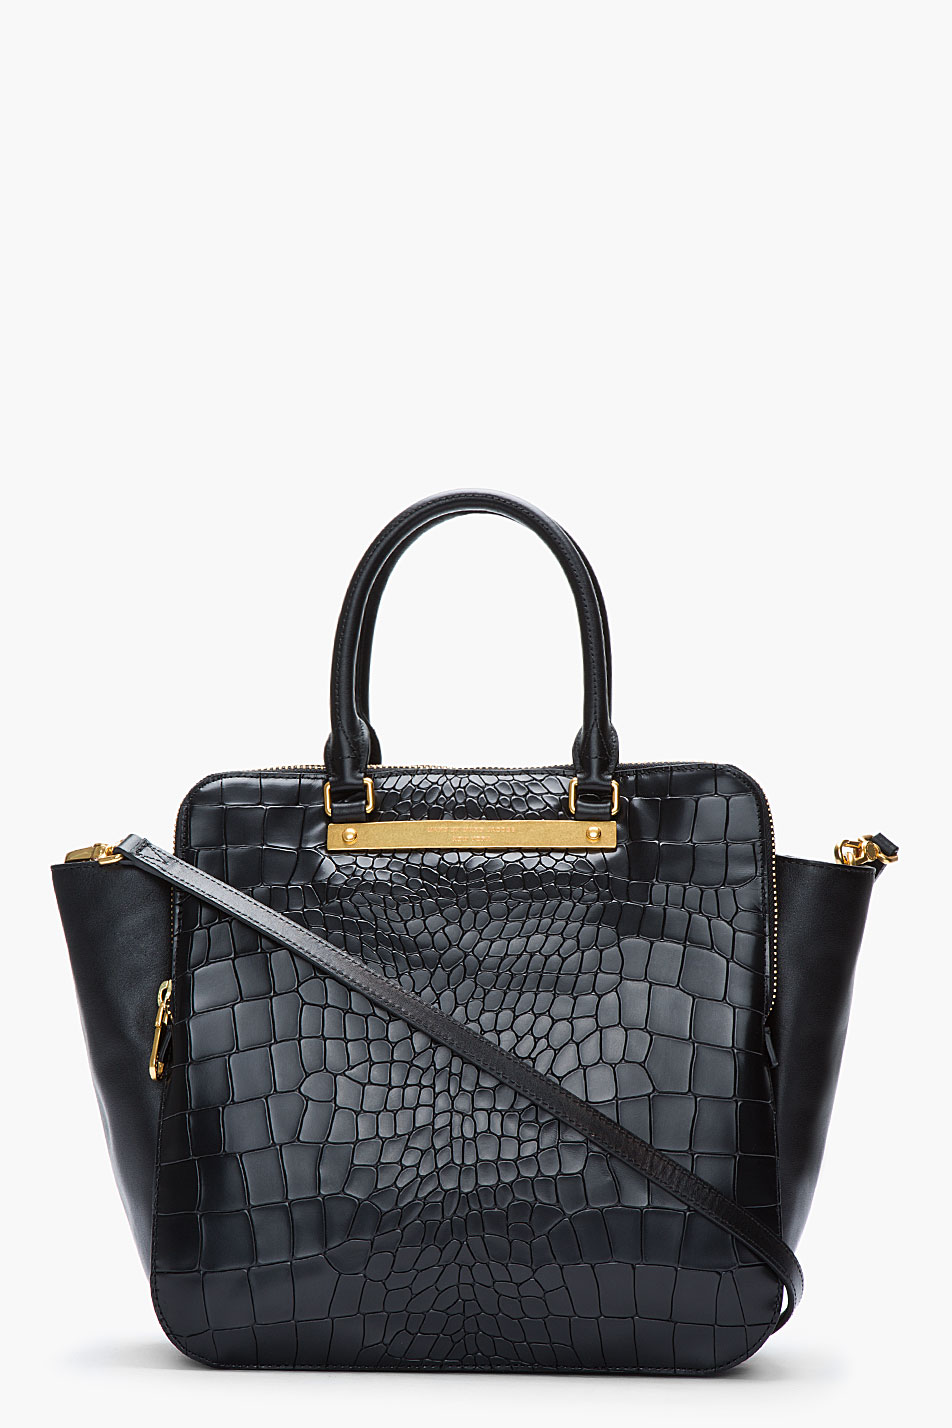 77553500b55b ou acheter sac a main sur internet. Classic q handbag MARC BY MARC JACOBS  ...